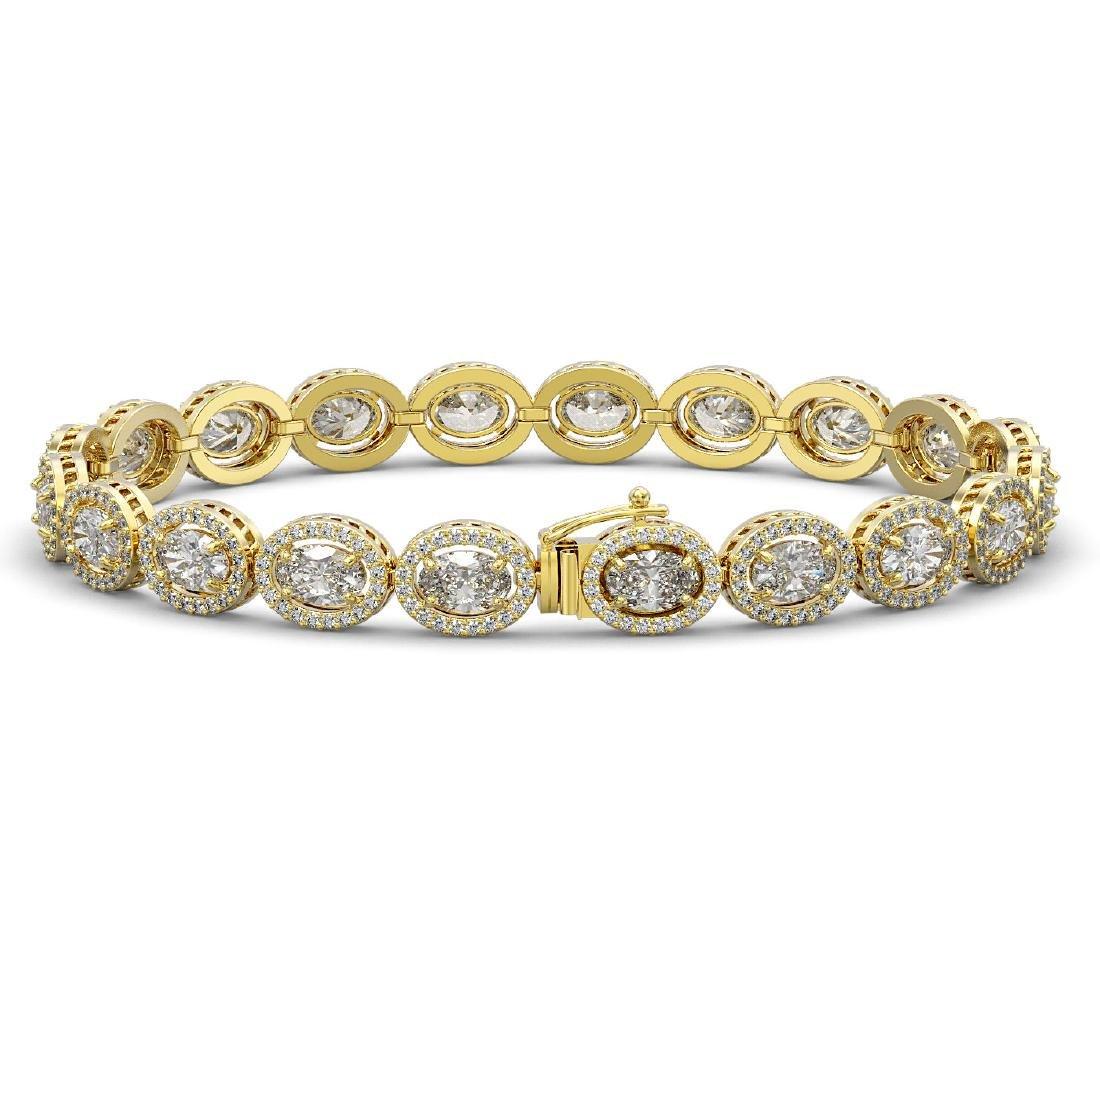 15.20 CTW Oval Diamond Designer Bracelet 18K Yellow - 2